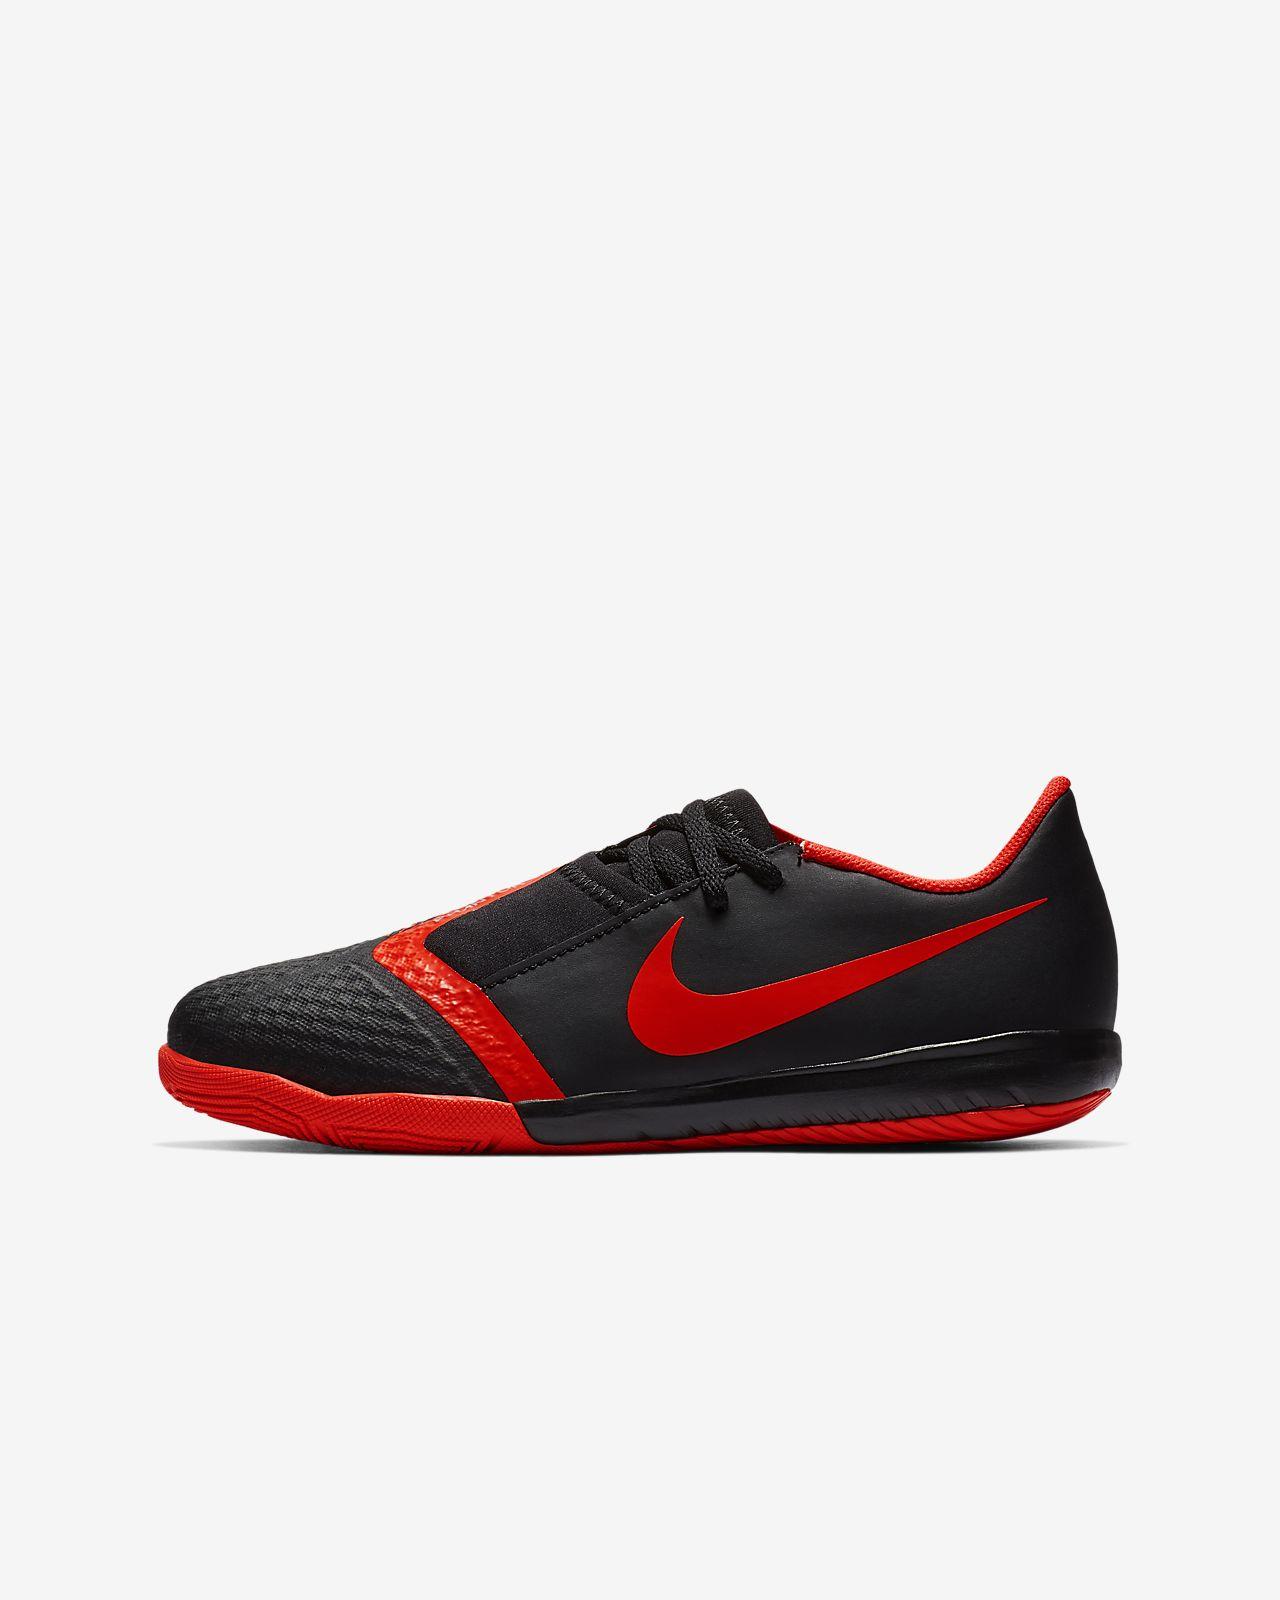 À Salle Chaussure Crampons Jr De Football En Nike Phantomvnm w6v1z